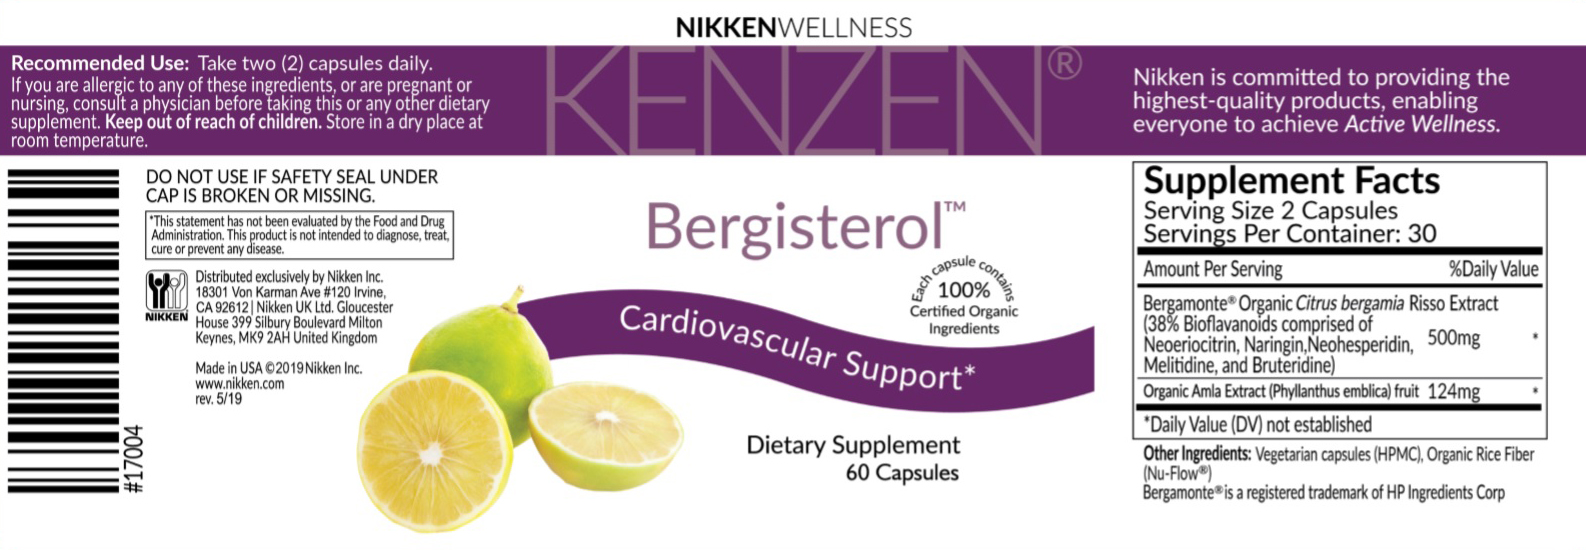 Bergisterol label